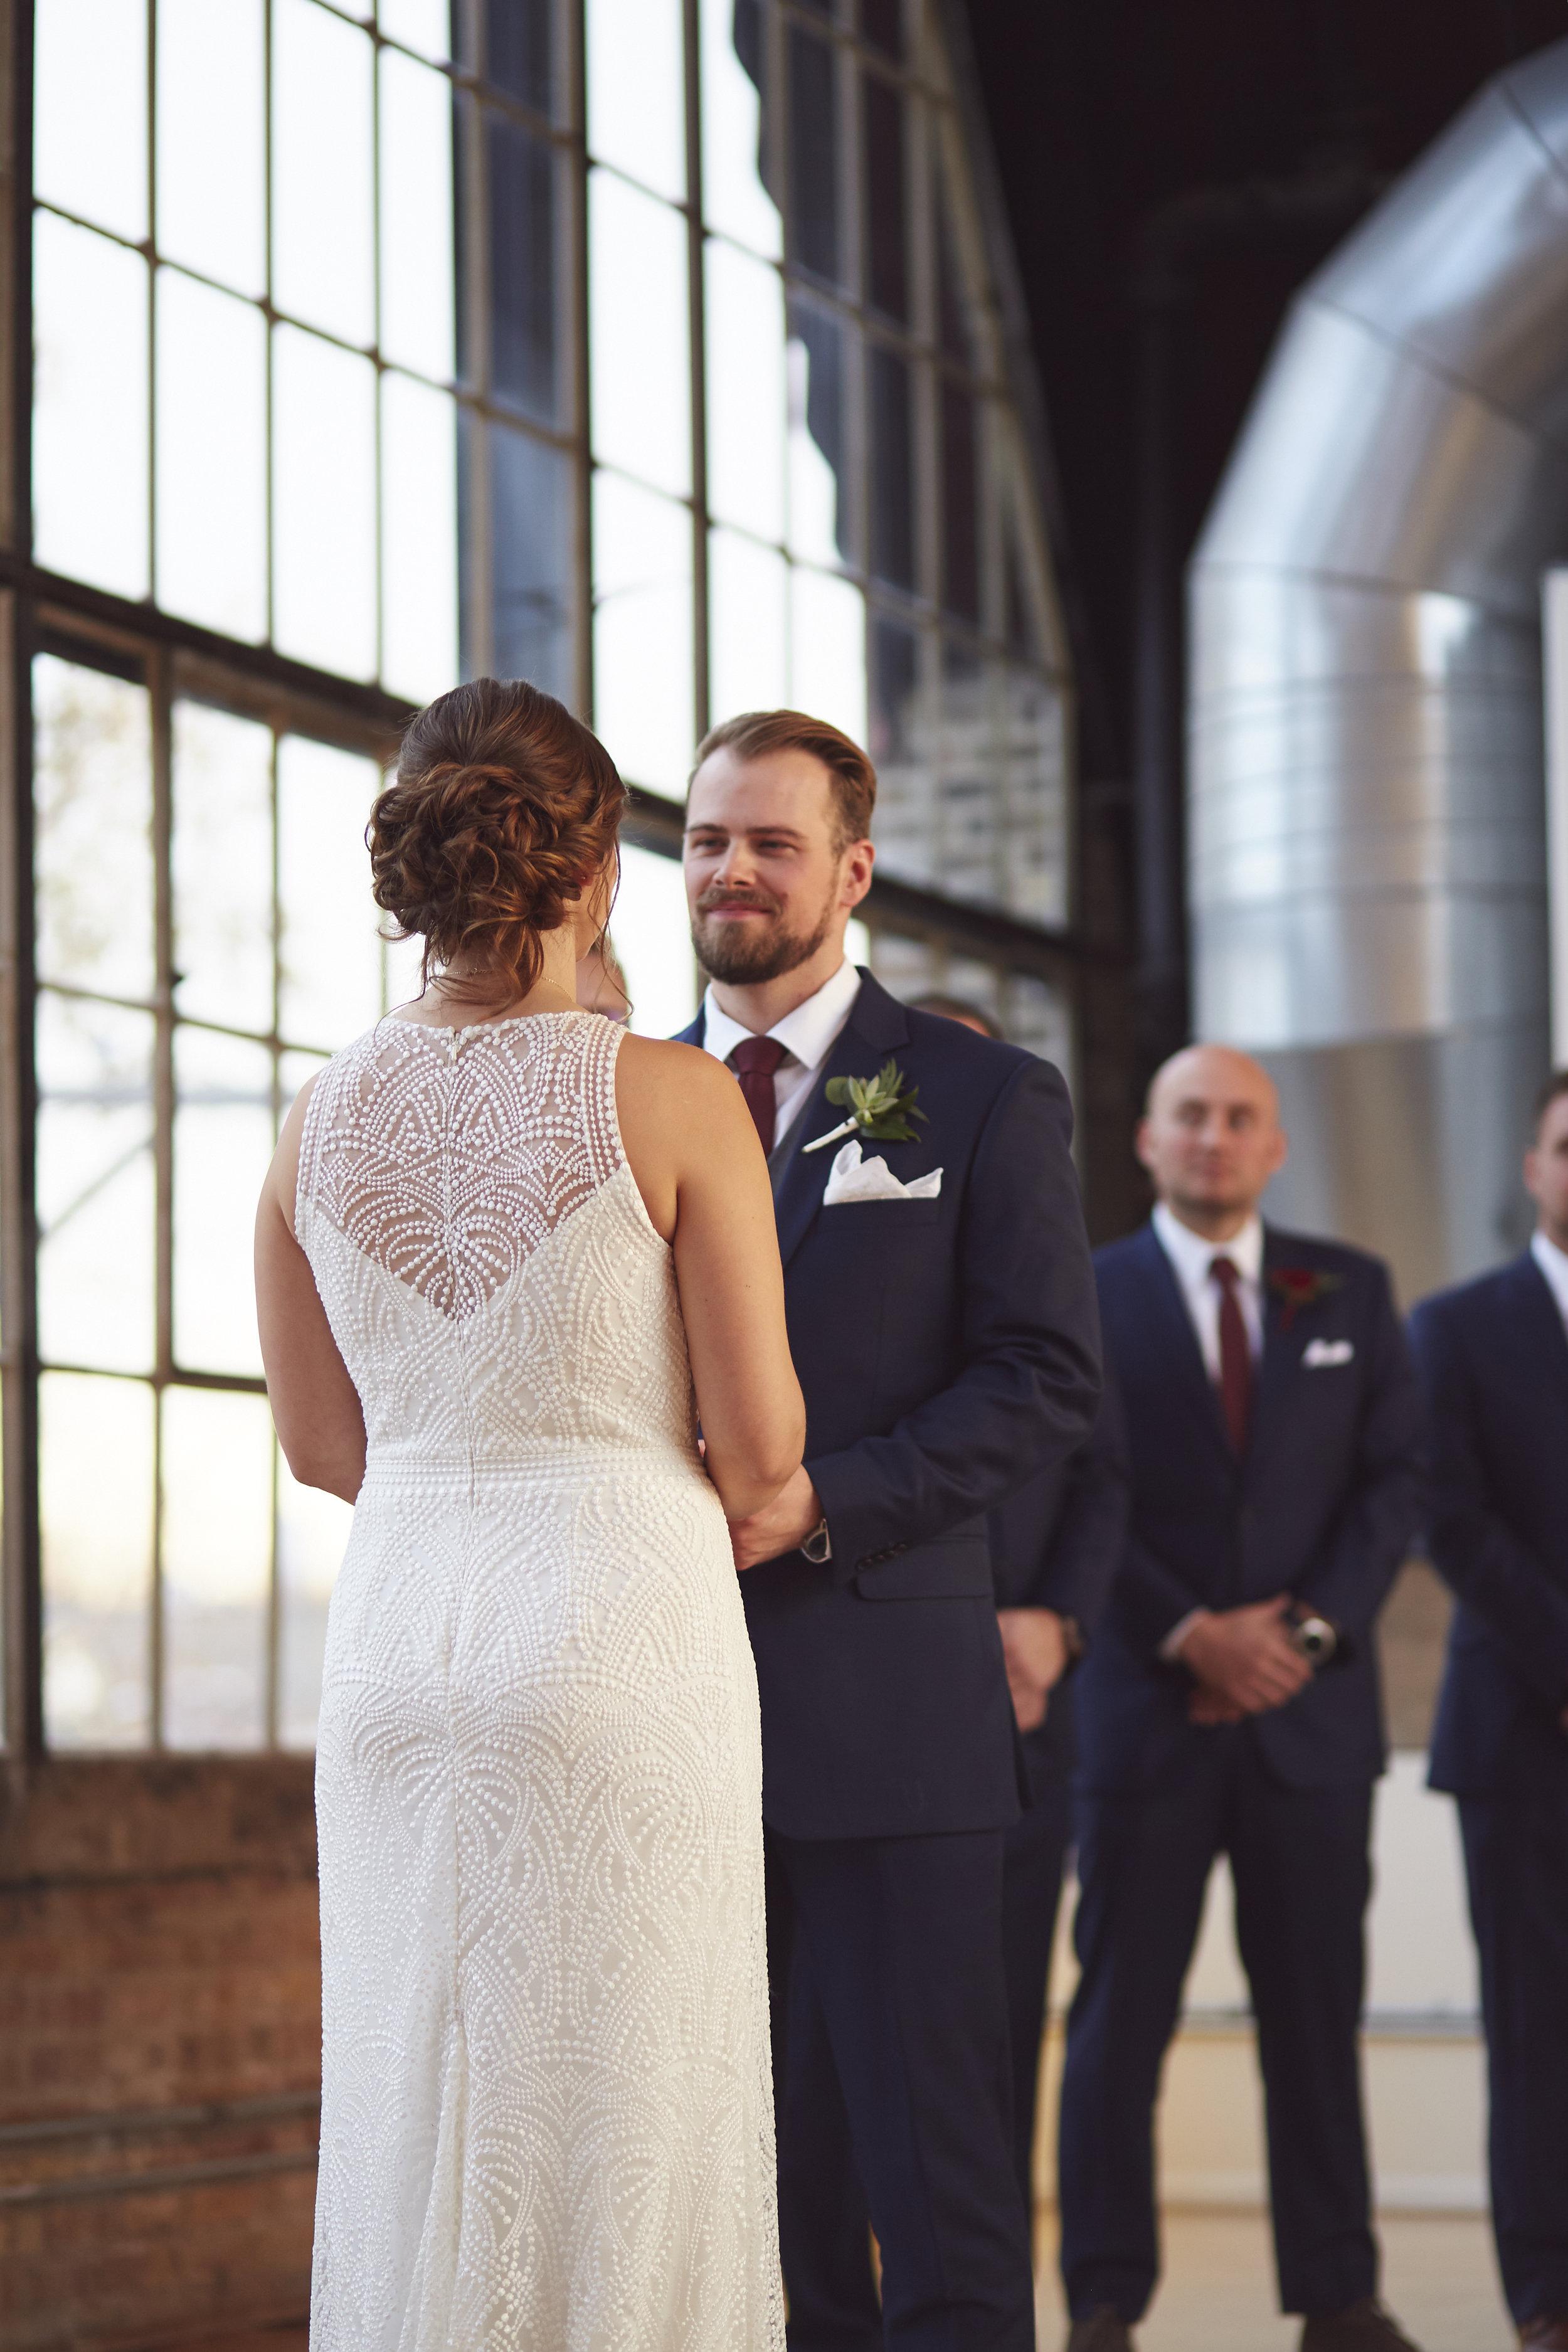 Jen & Ben Wedding - benromangphoto - 6I5A3632.jpg